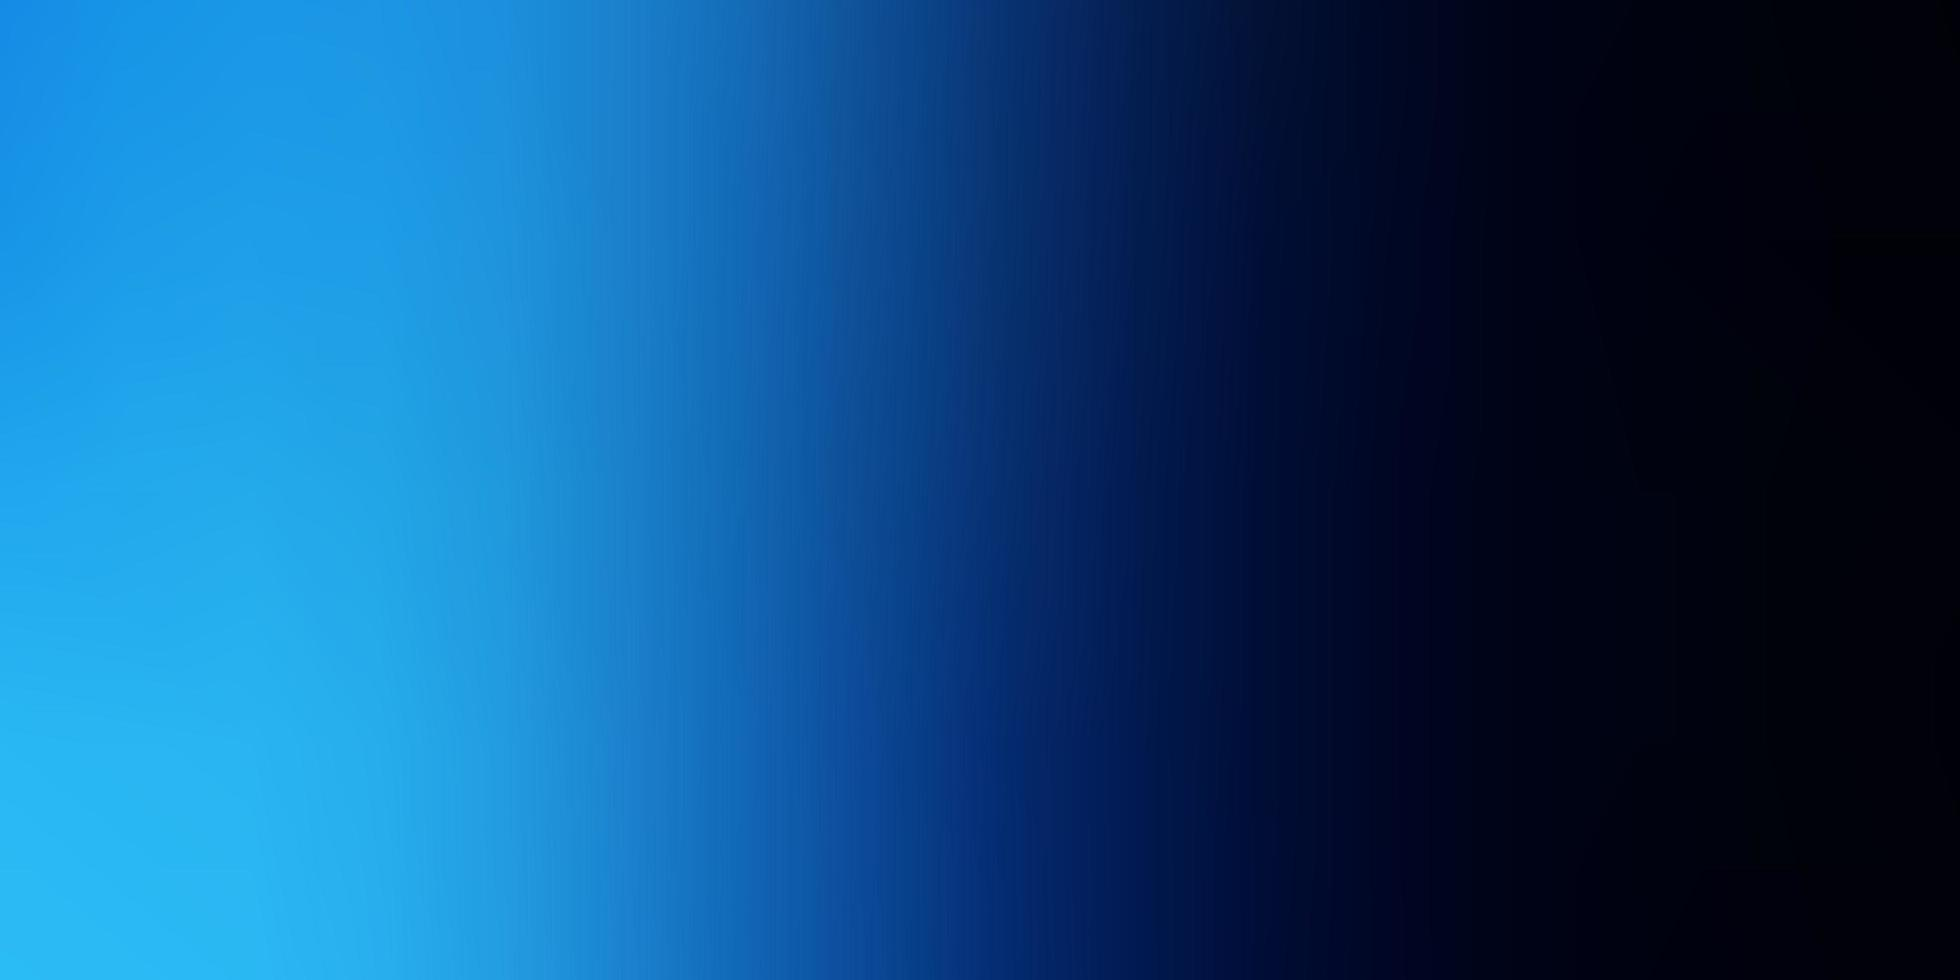 vetor azul escuro turva padrão colorido.